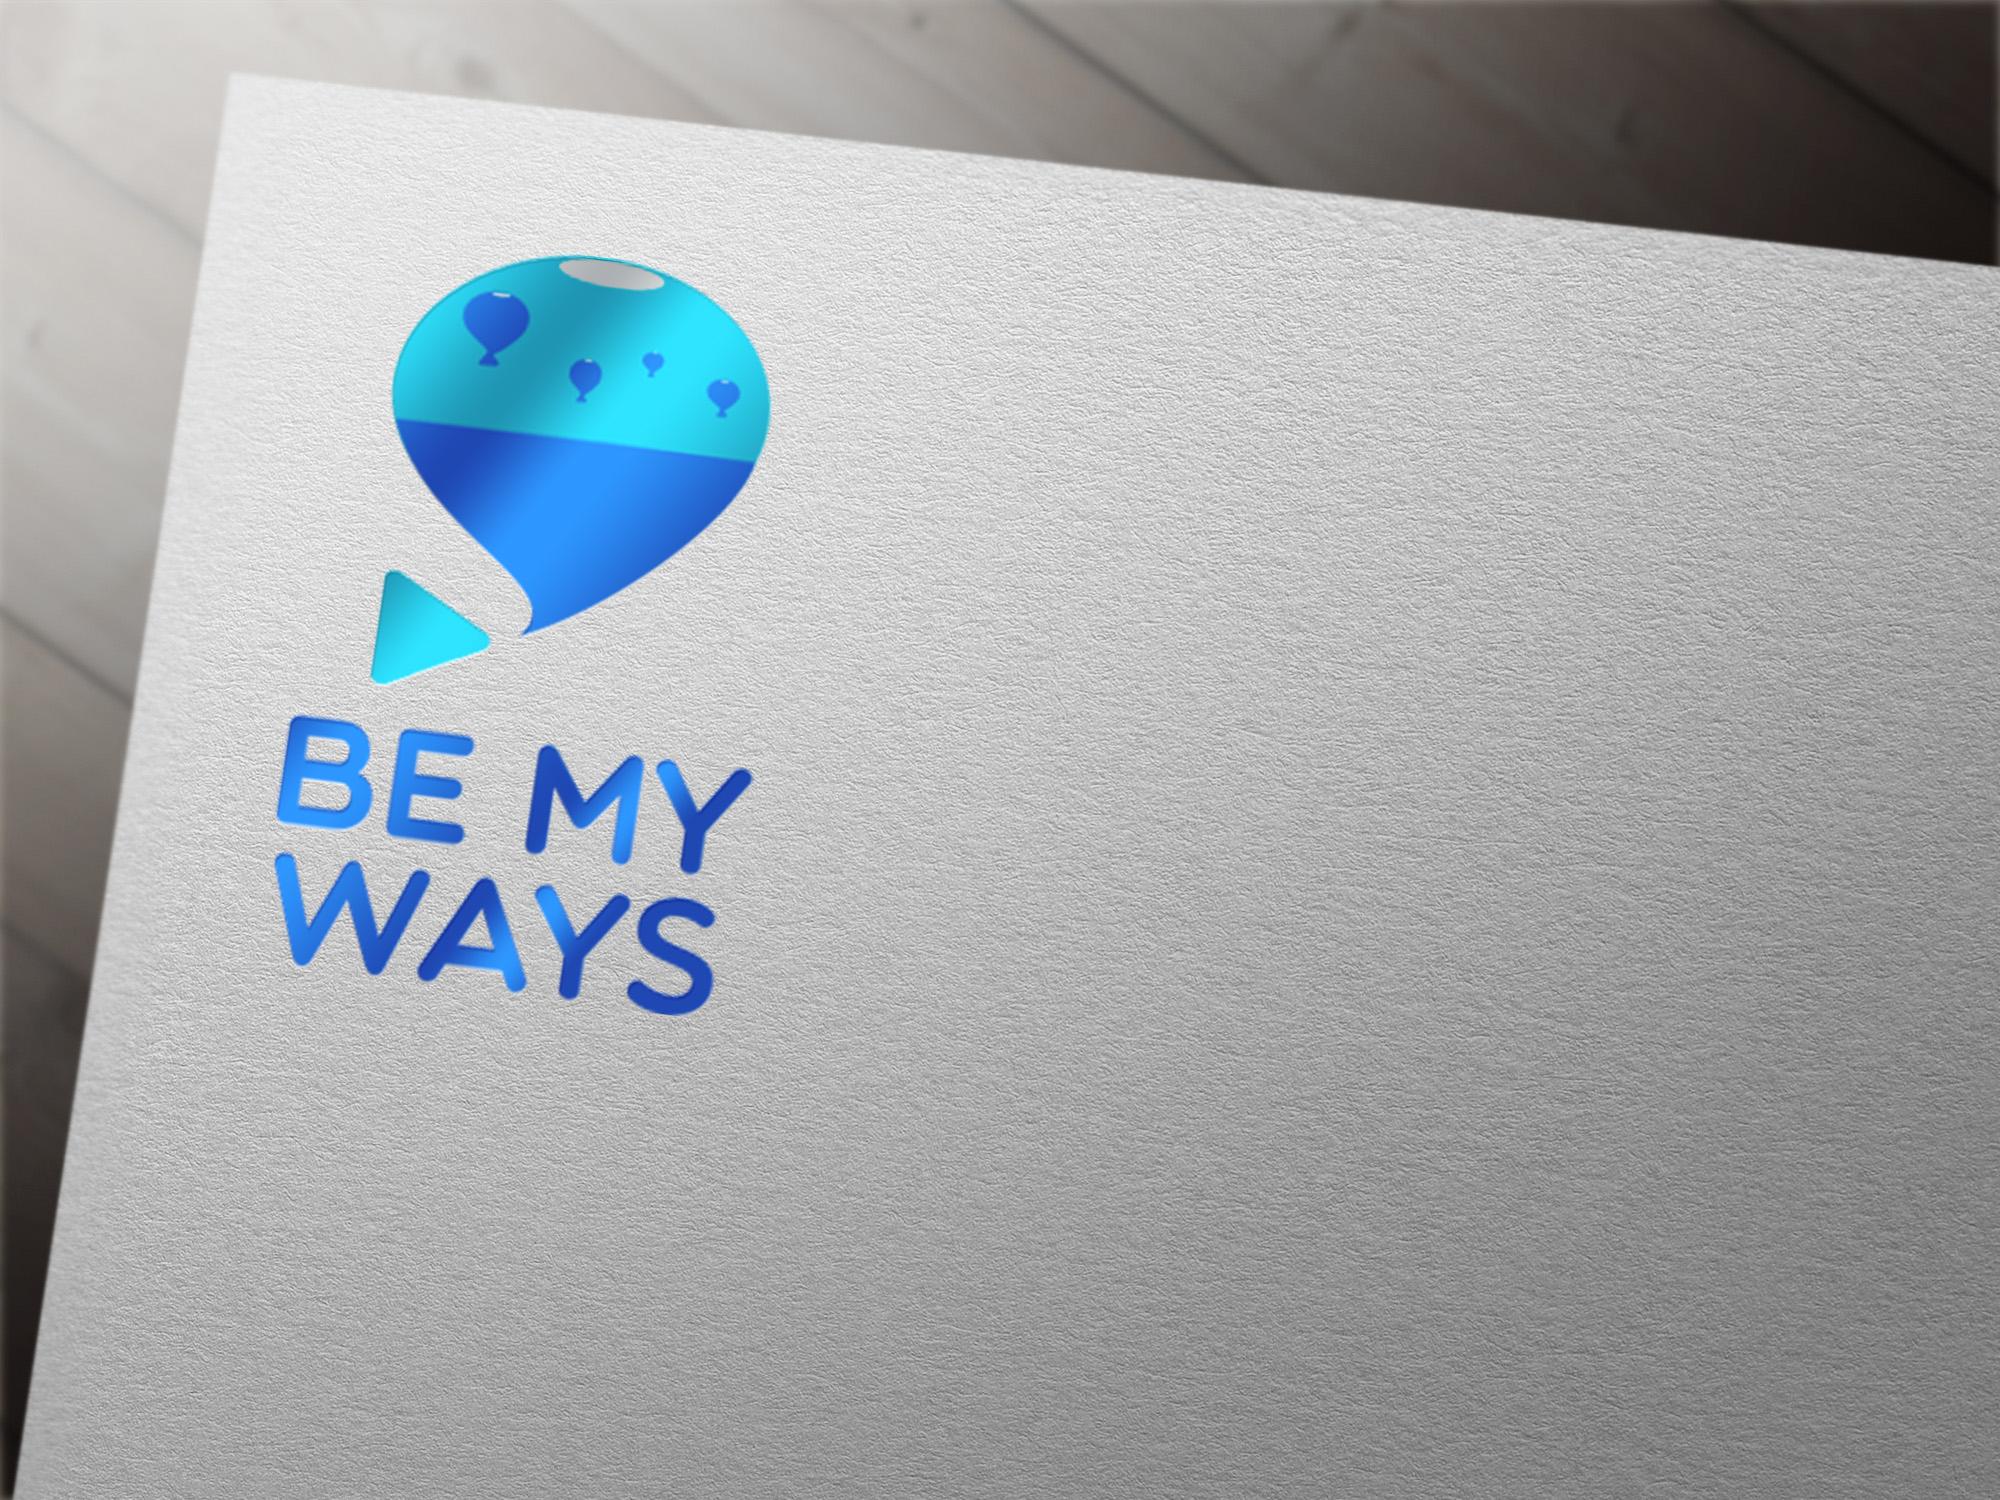 Разработка логотипа и иконки для Travel Video Platform фото f_3355c3d1b02a49a3.jpg